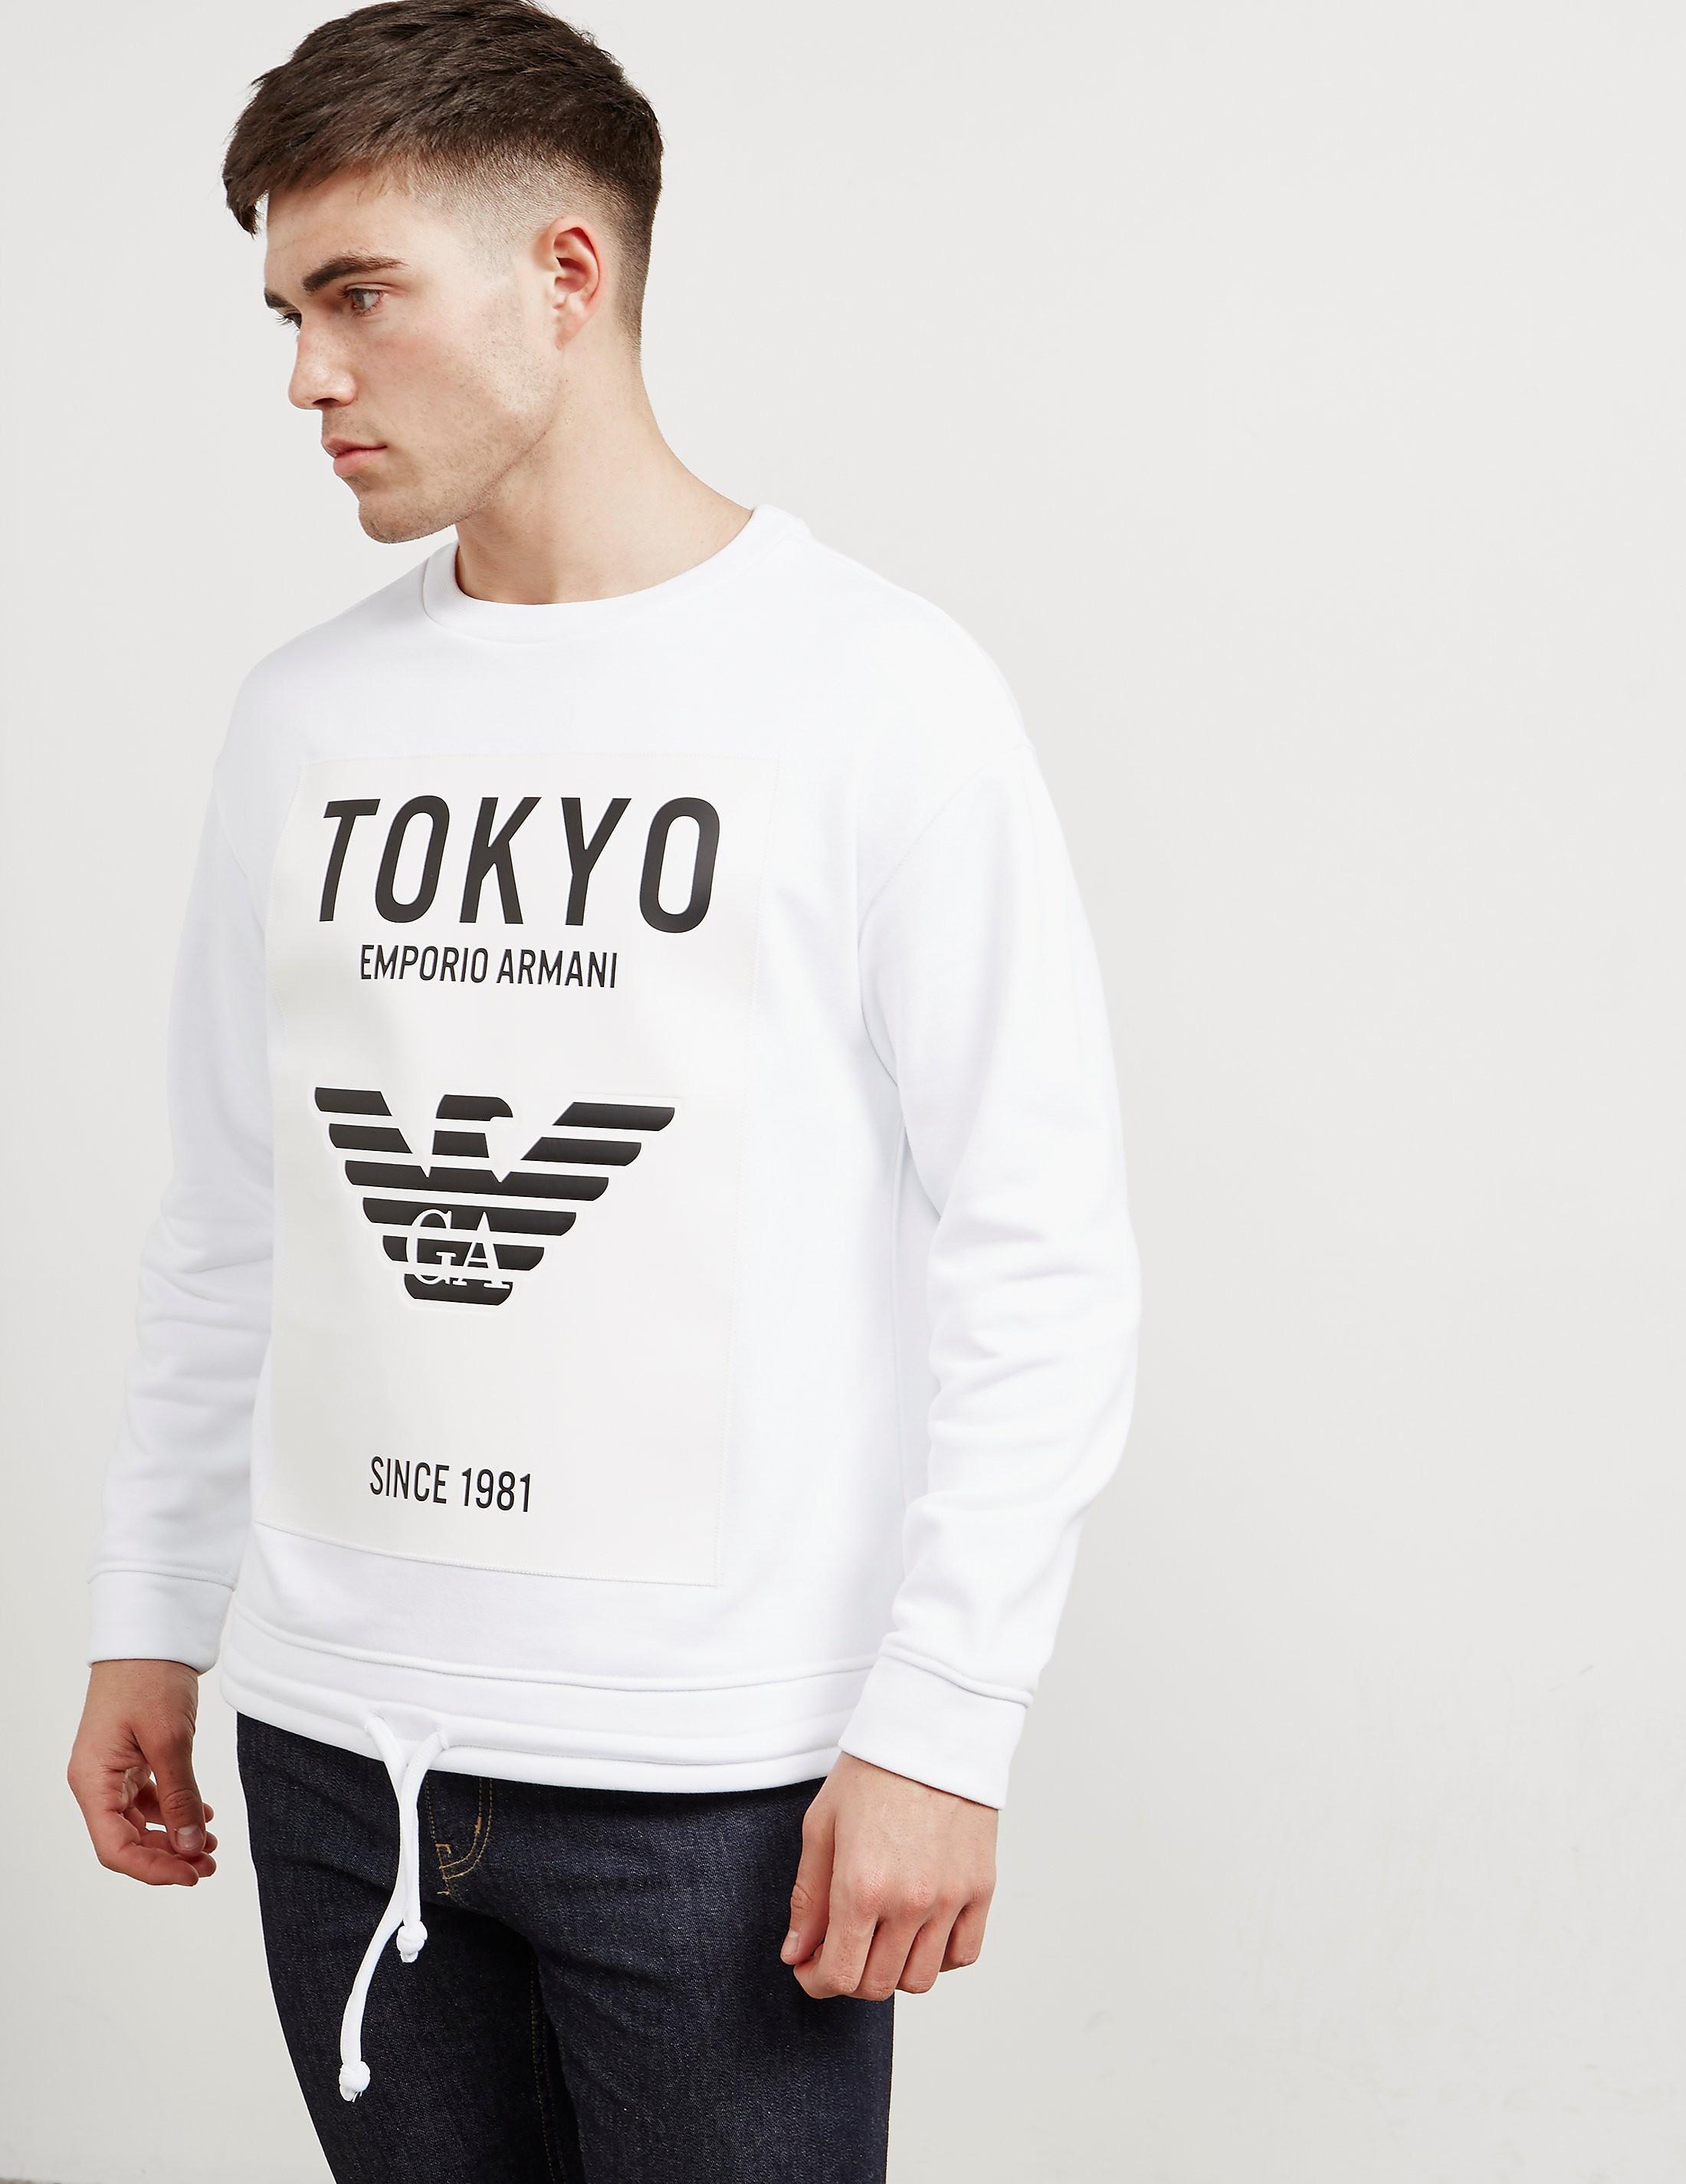 Emporio Armani Tokyo Sweatshirt